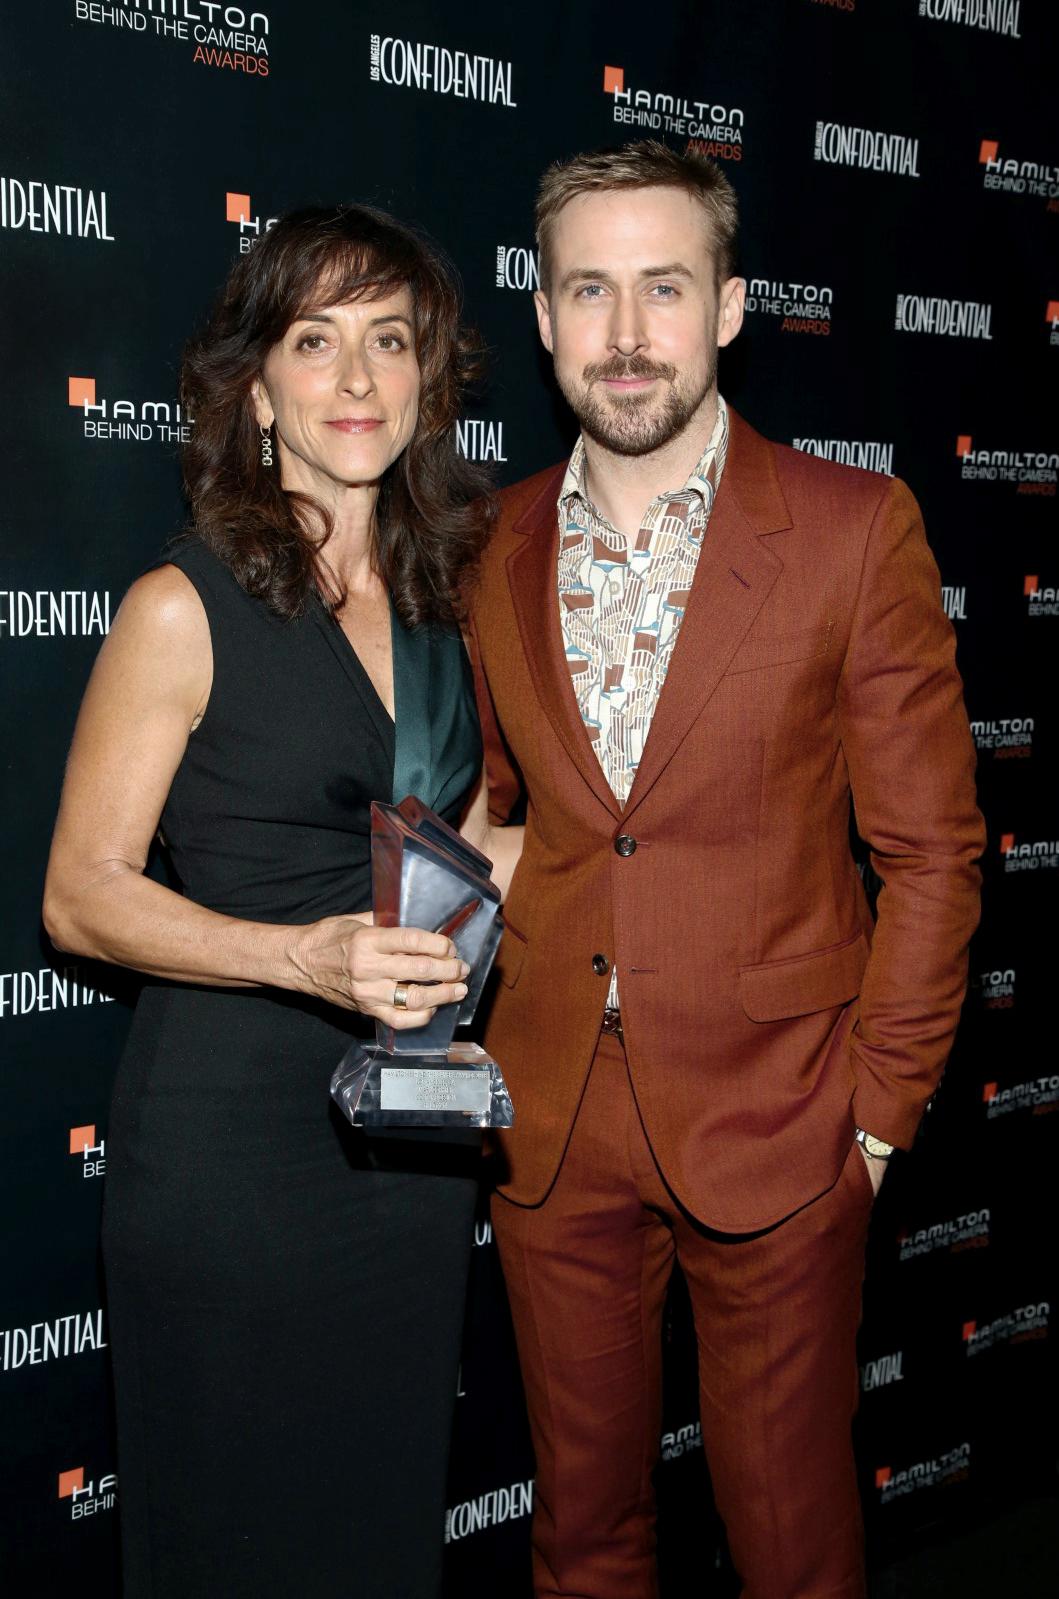 Hamilton Behind the Camera Awards 2018 - Mary Zophres & Ryan Gosling - Backstage.